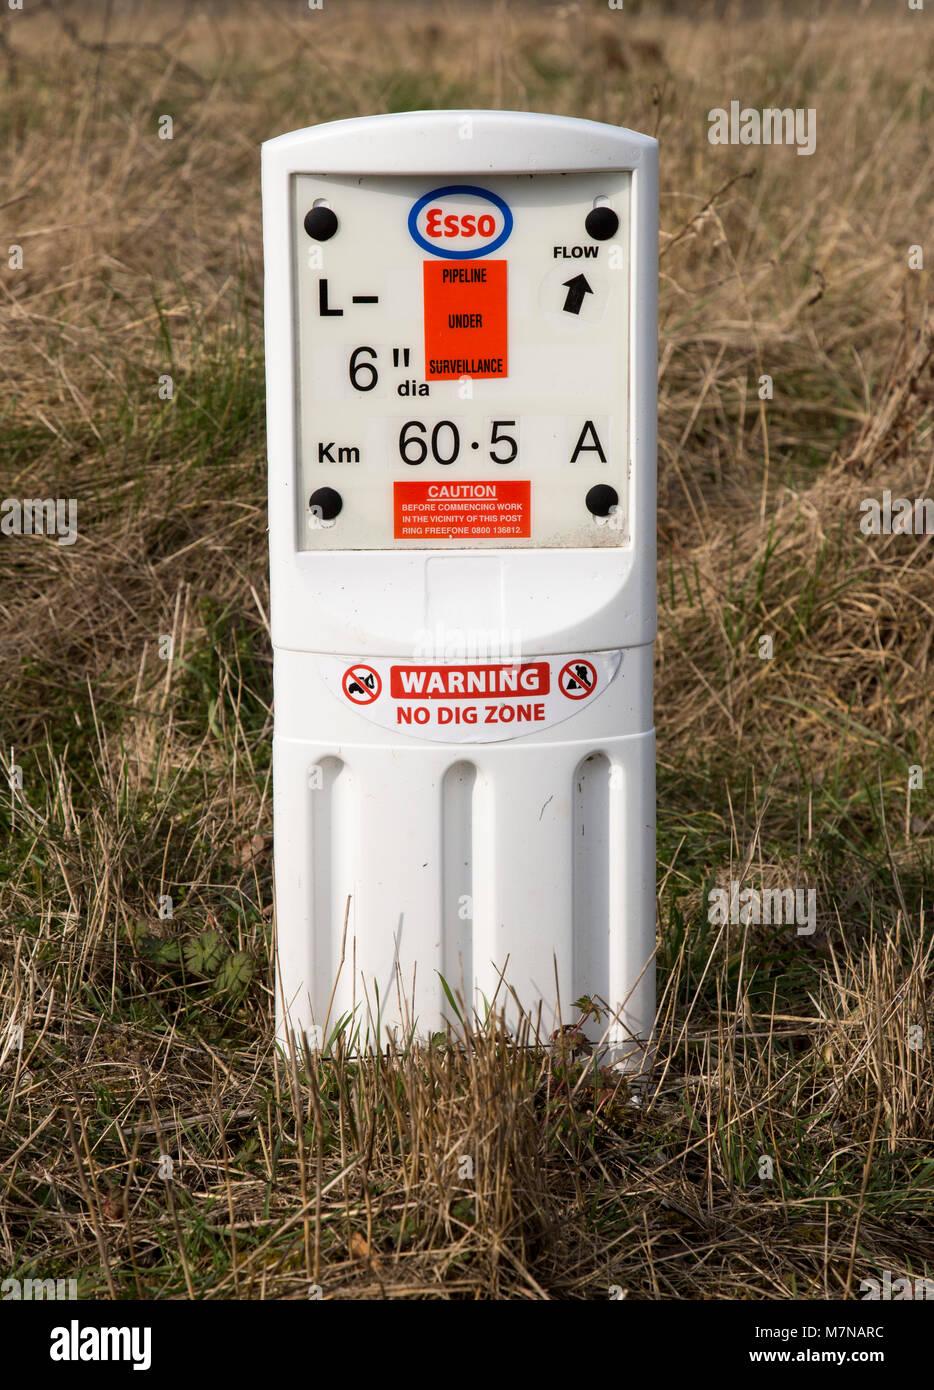 Close up of Esso gas pipeline under surveillance marker warning no dig zone, Salisbury Plain, Wiltshire, England, - Stock Image